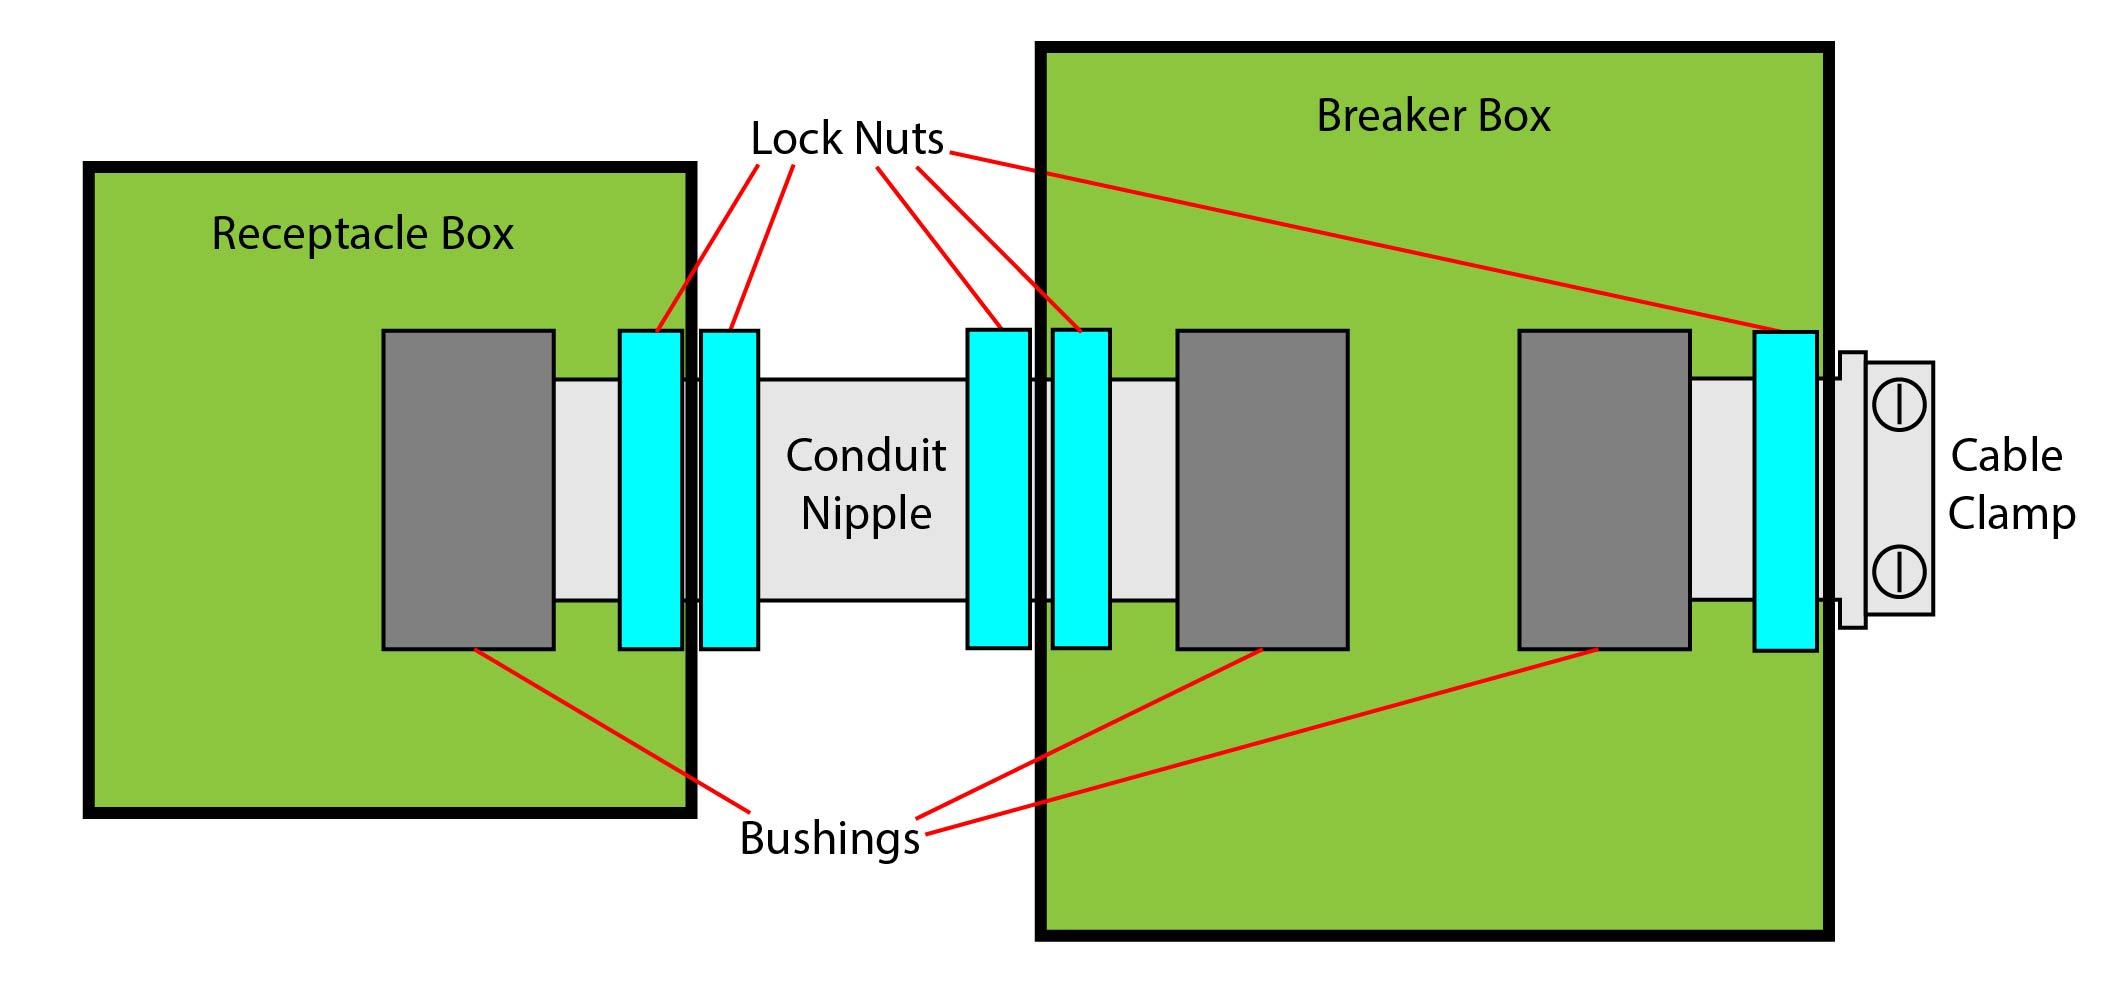 50 amp plug wiring diagram dolgular 50 amp welder wiring diagram dolgular asfbconference2016 Image collections